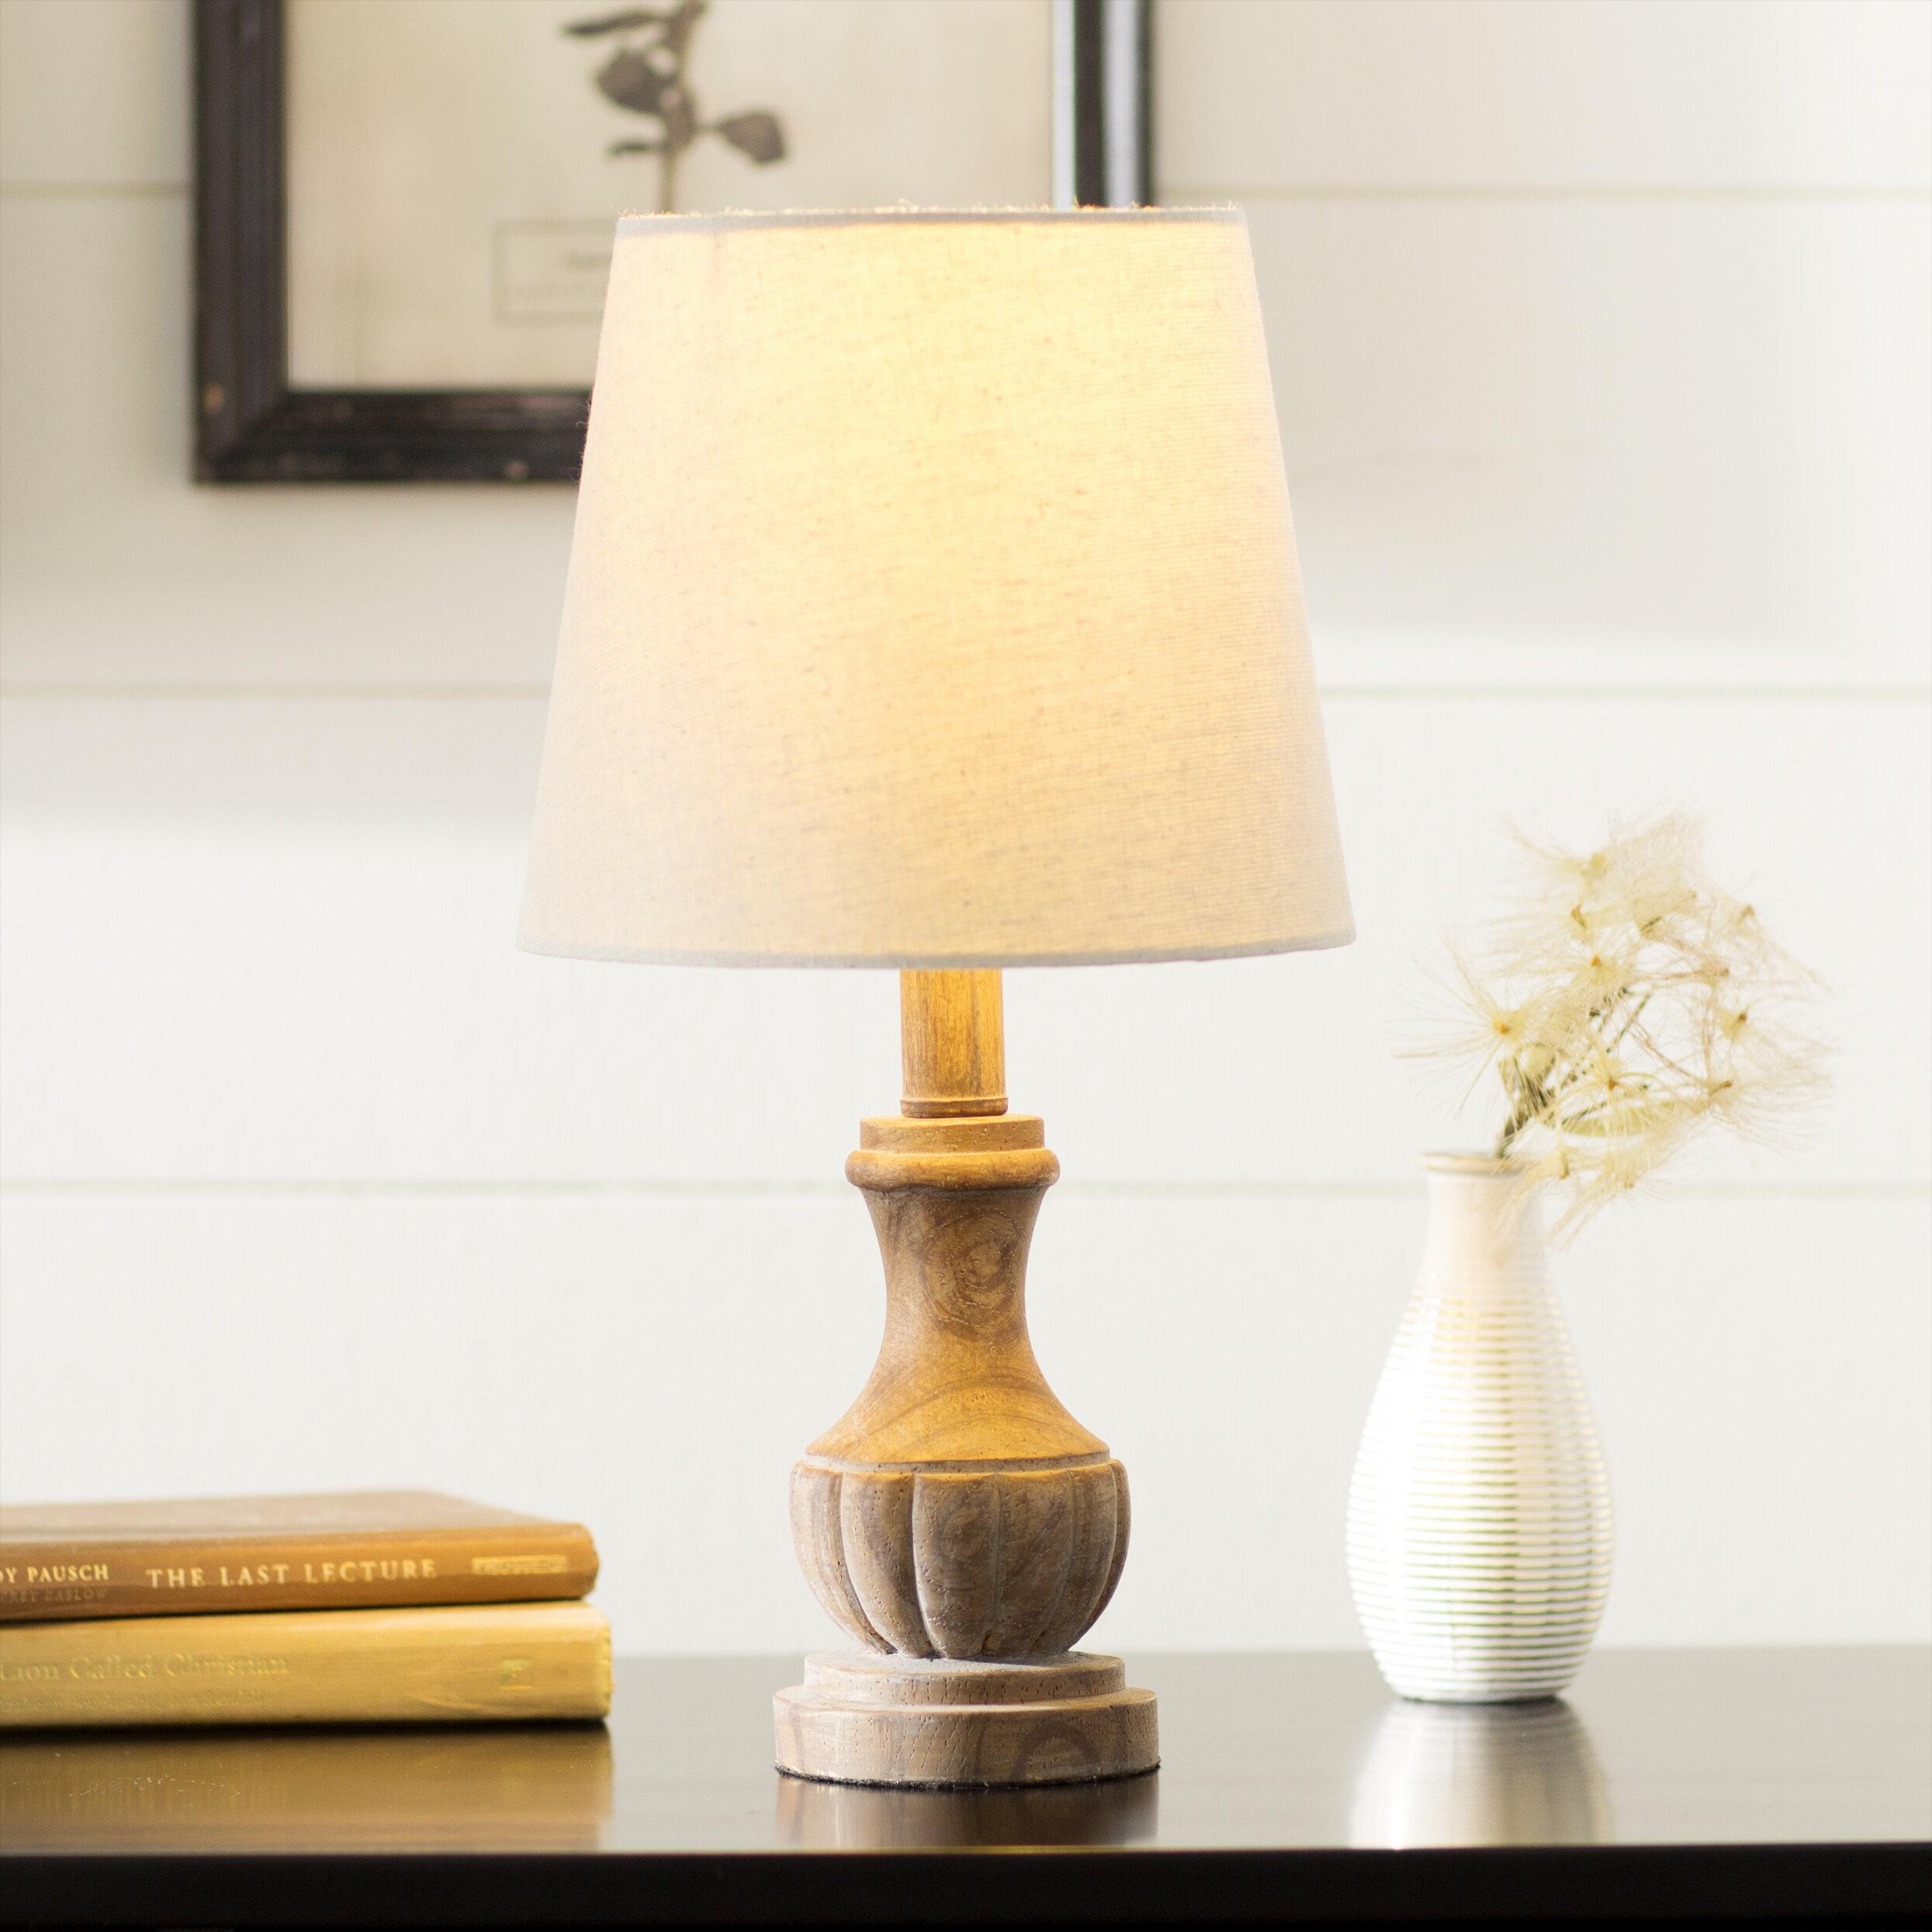 Laurel foundry modern farmhouse brentwood polyresin 15 table lamp reviews wayfair